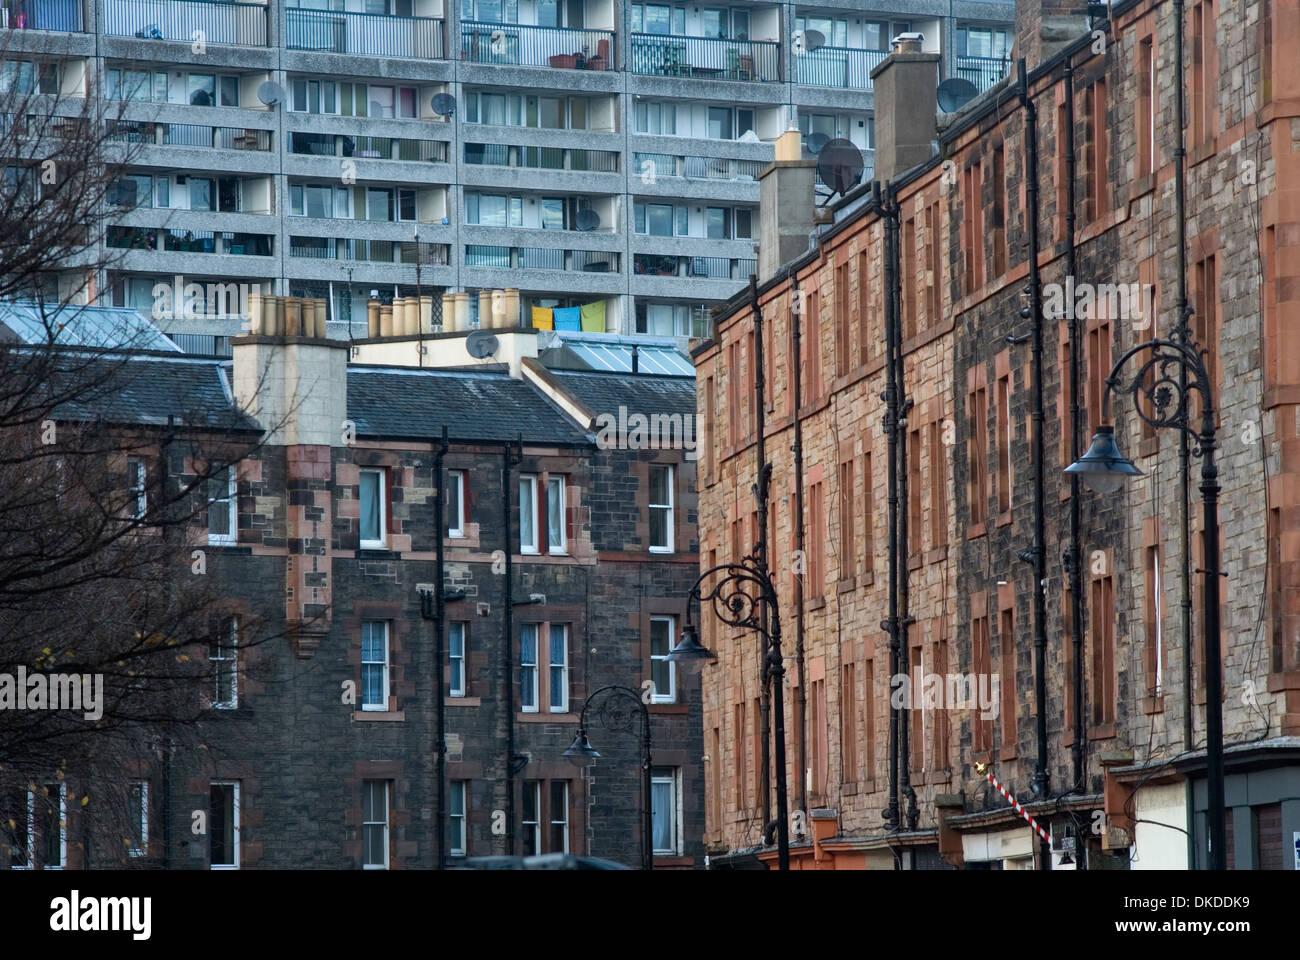 Leith, Edinburgh, Scotland, UK, Europe Stock Photo